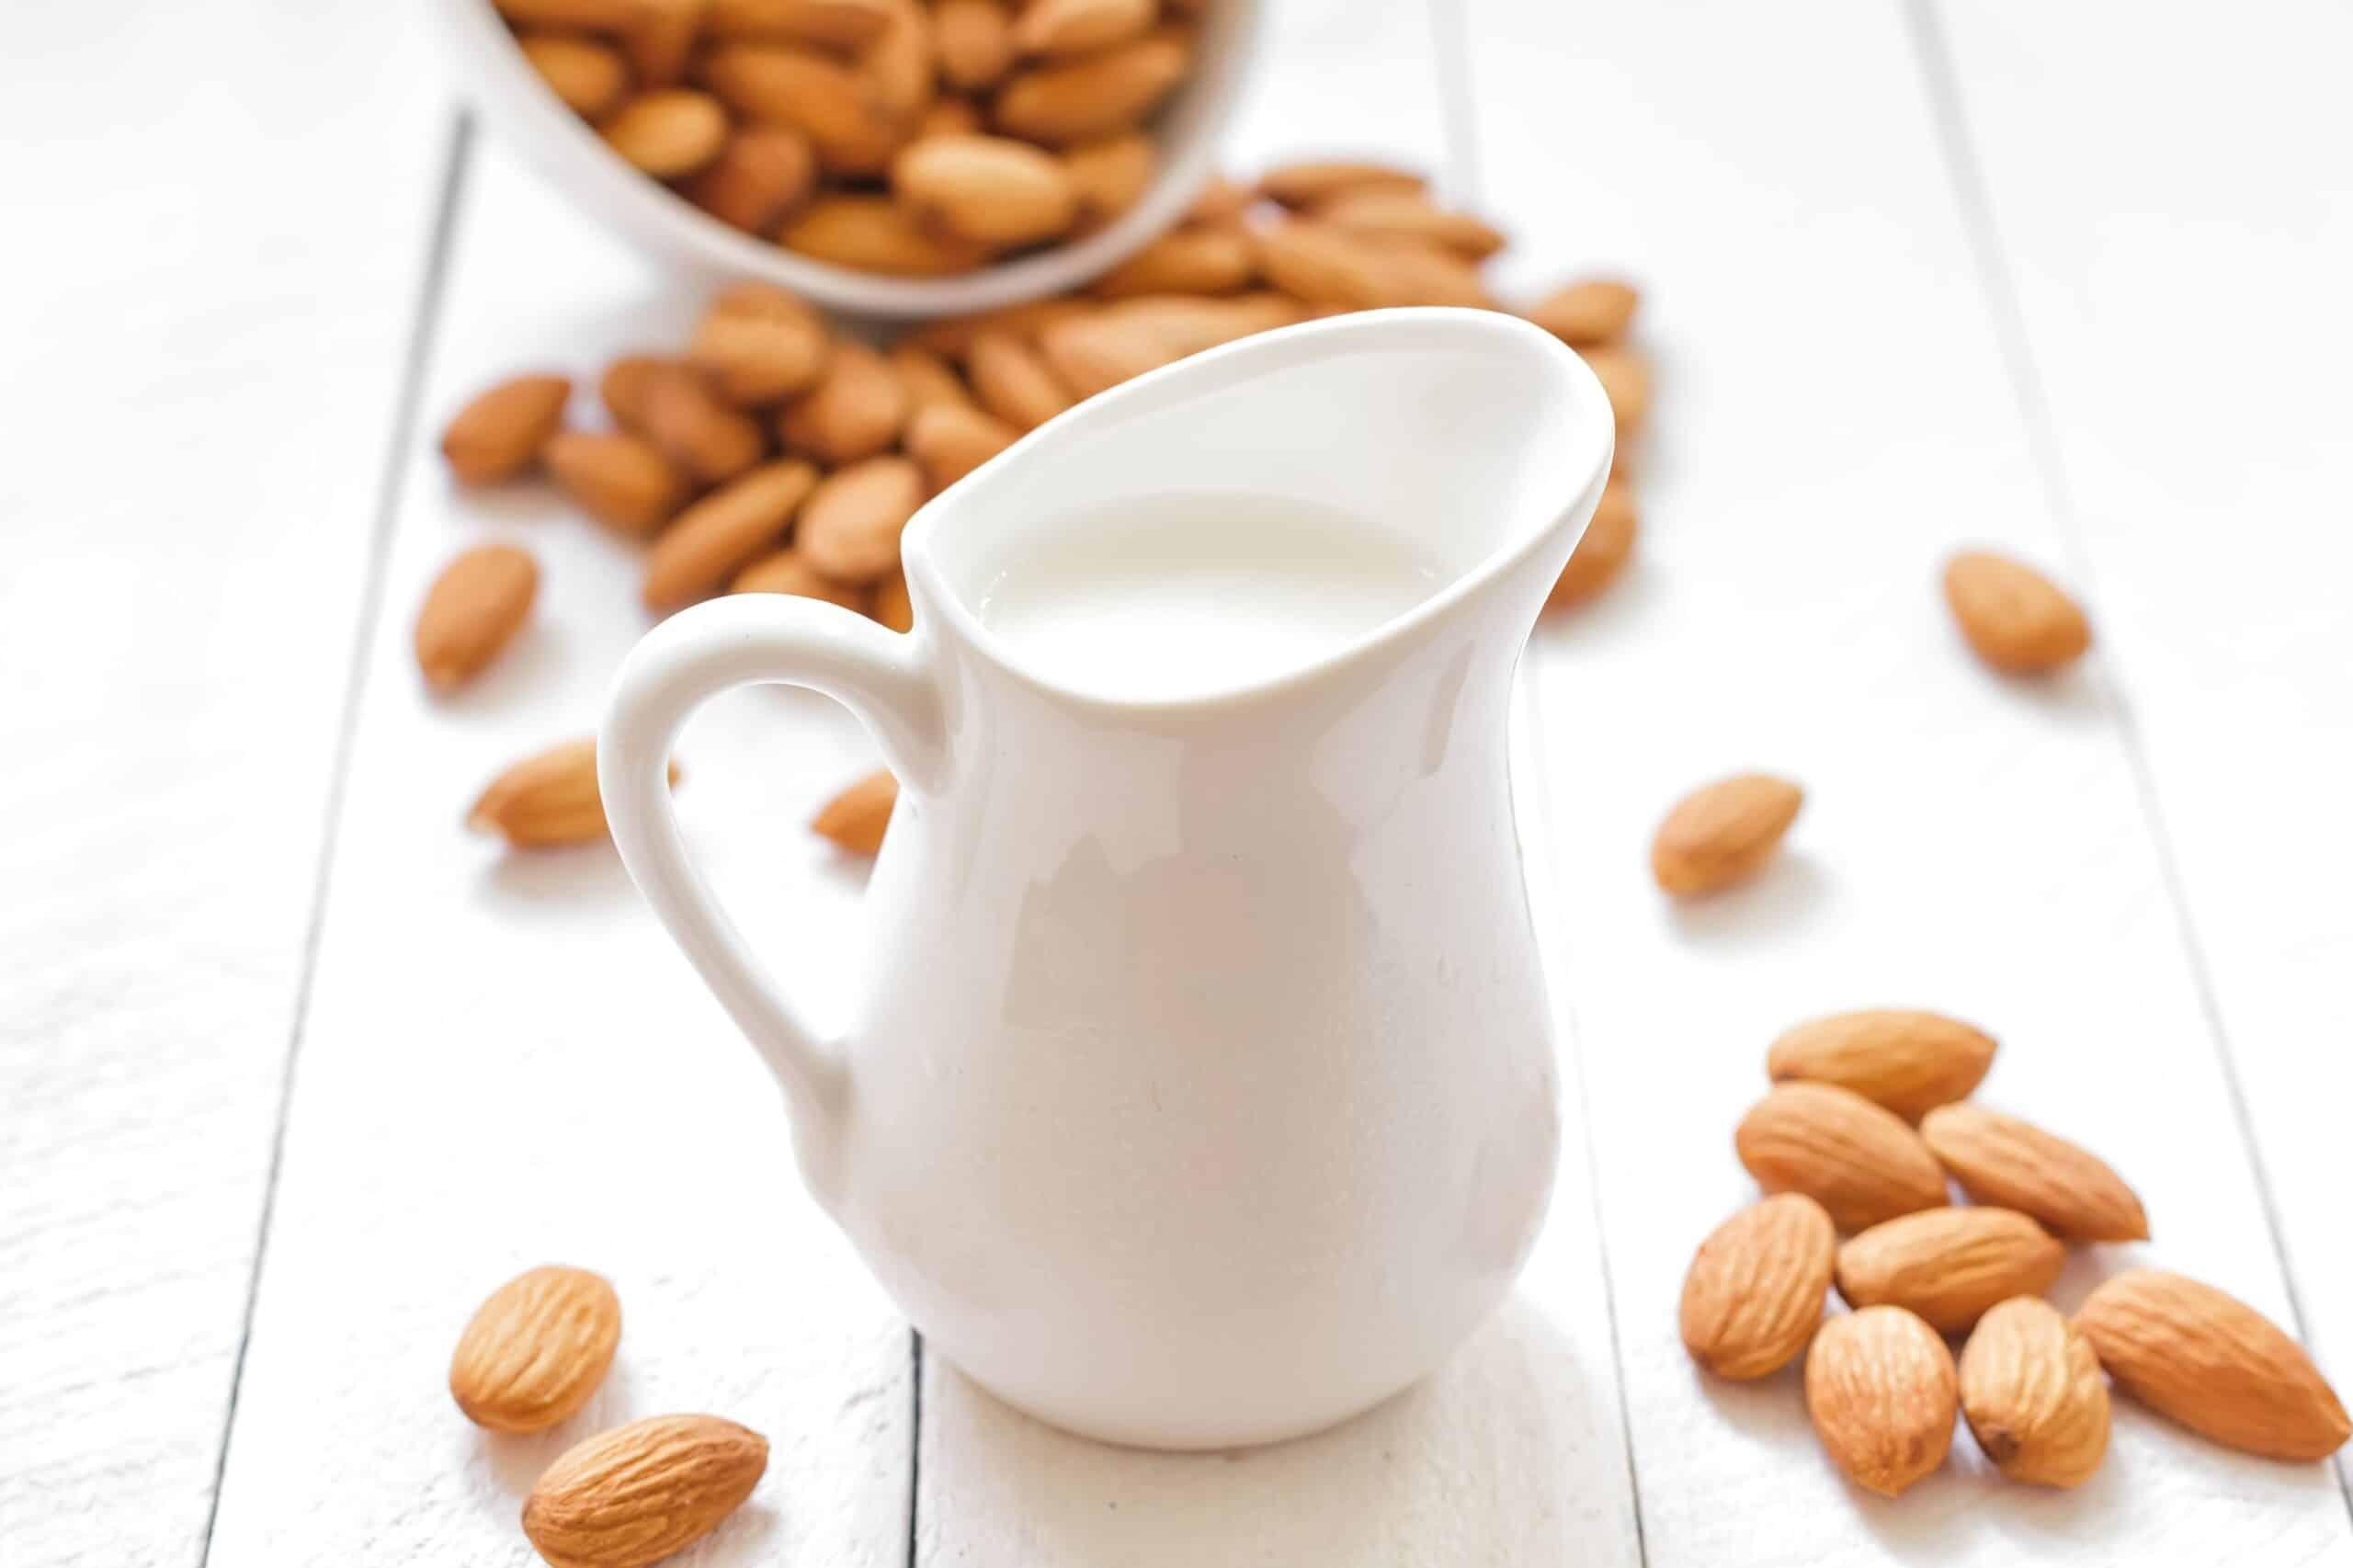 almond-milk-680287428-5ac11adfc67335003798629d-2327081